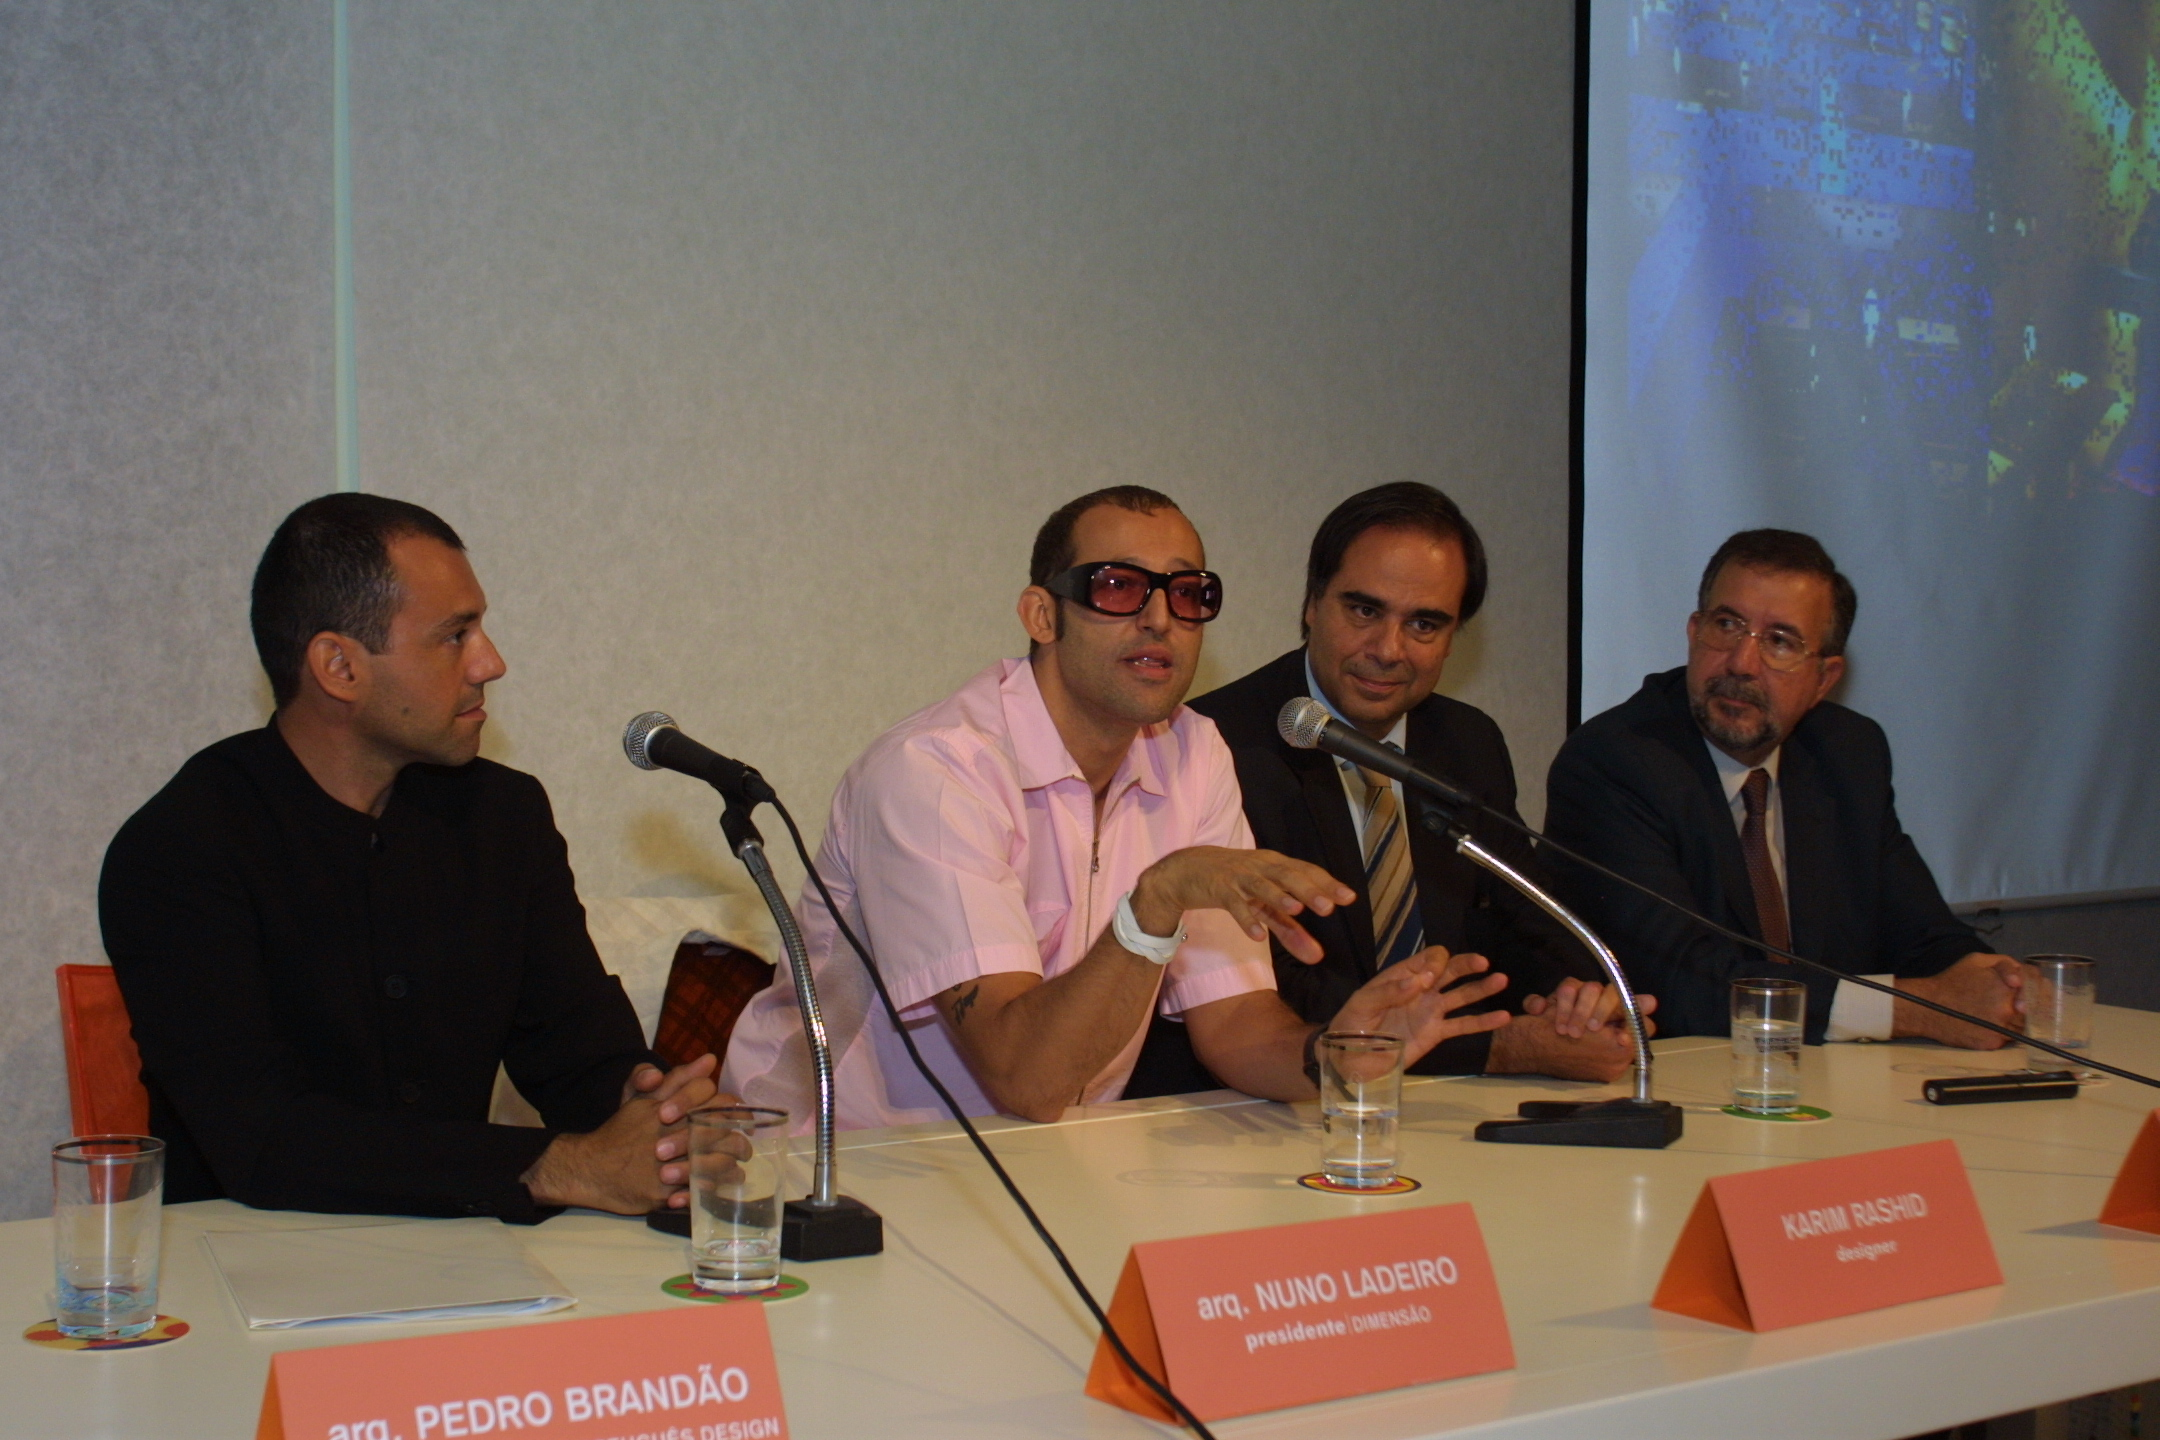 Conferência com Karim Rashid